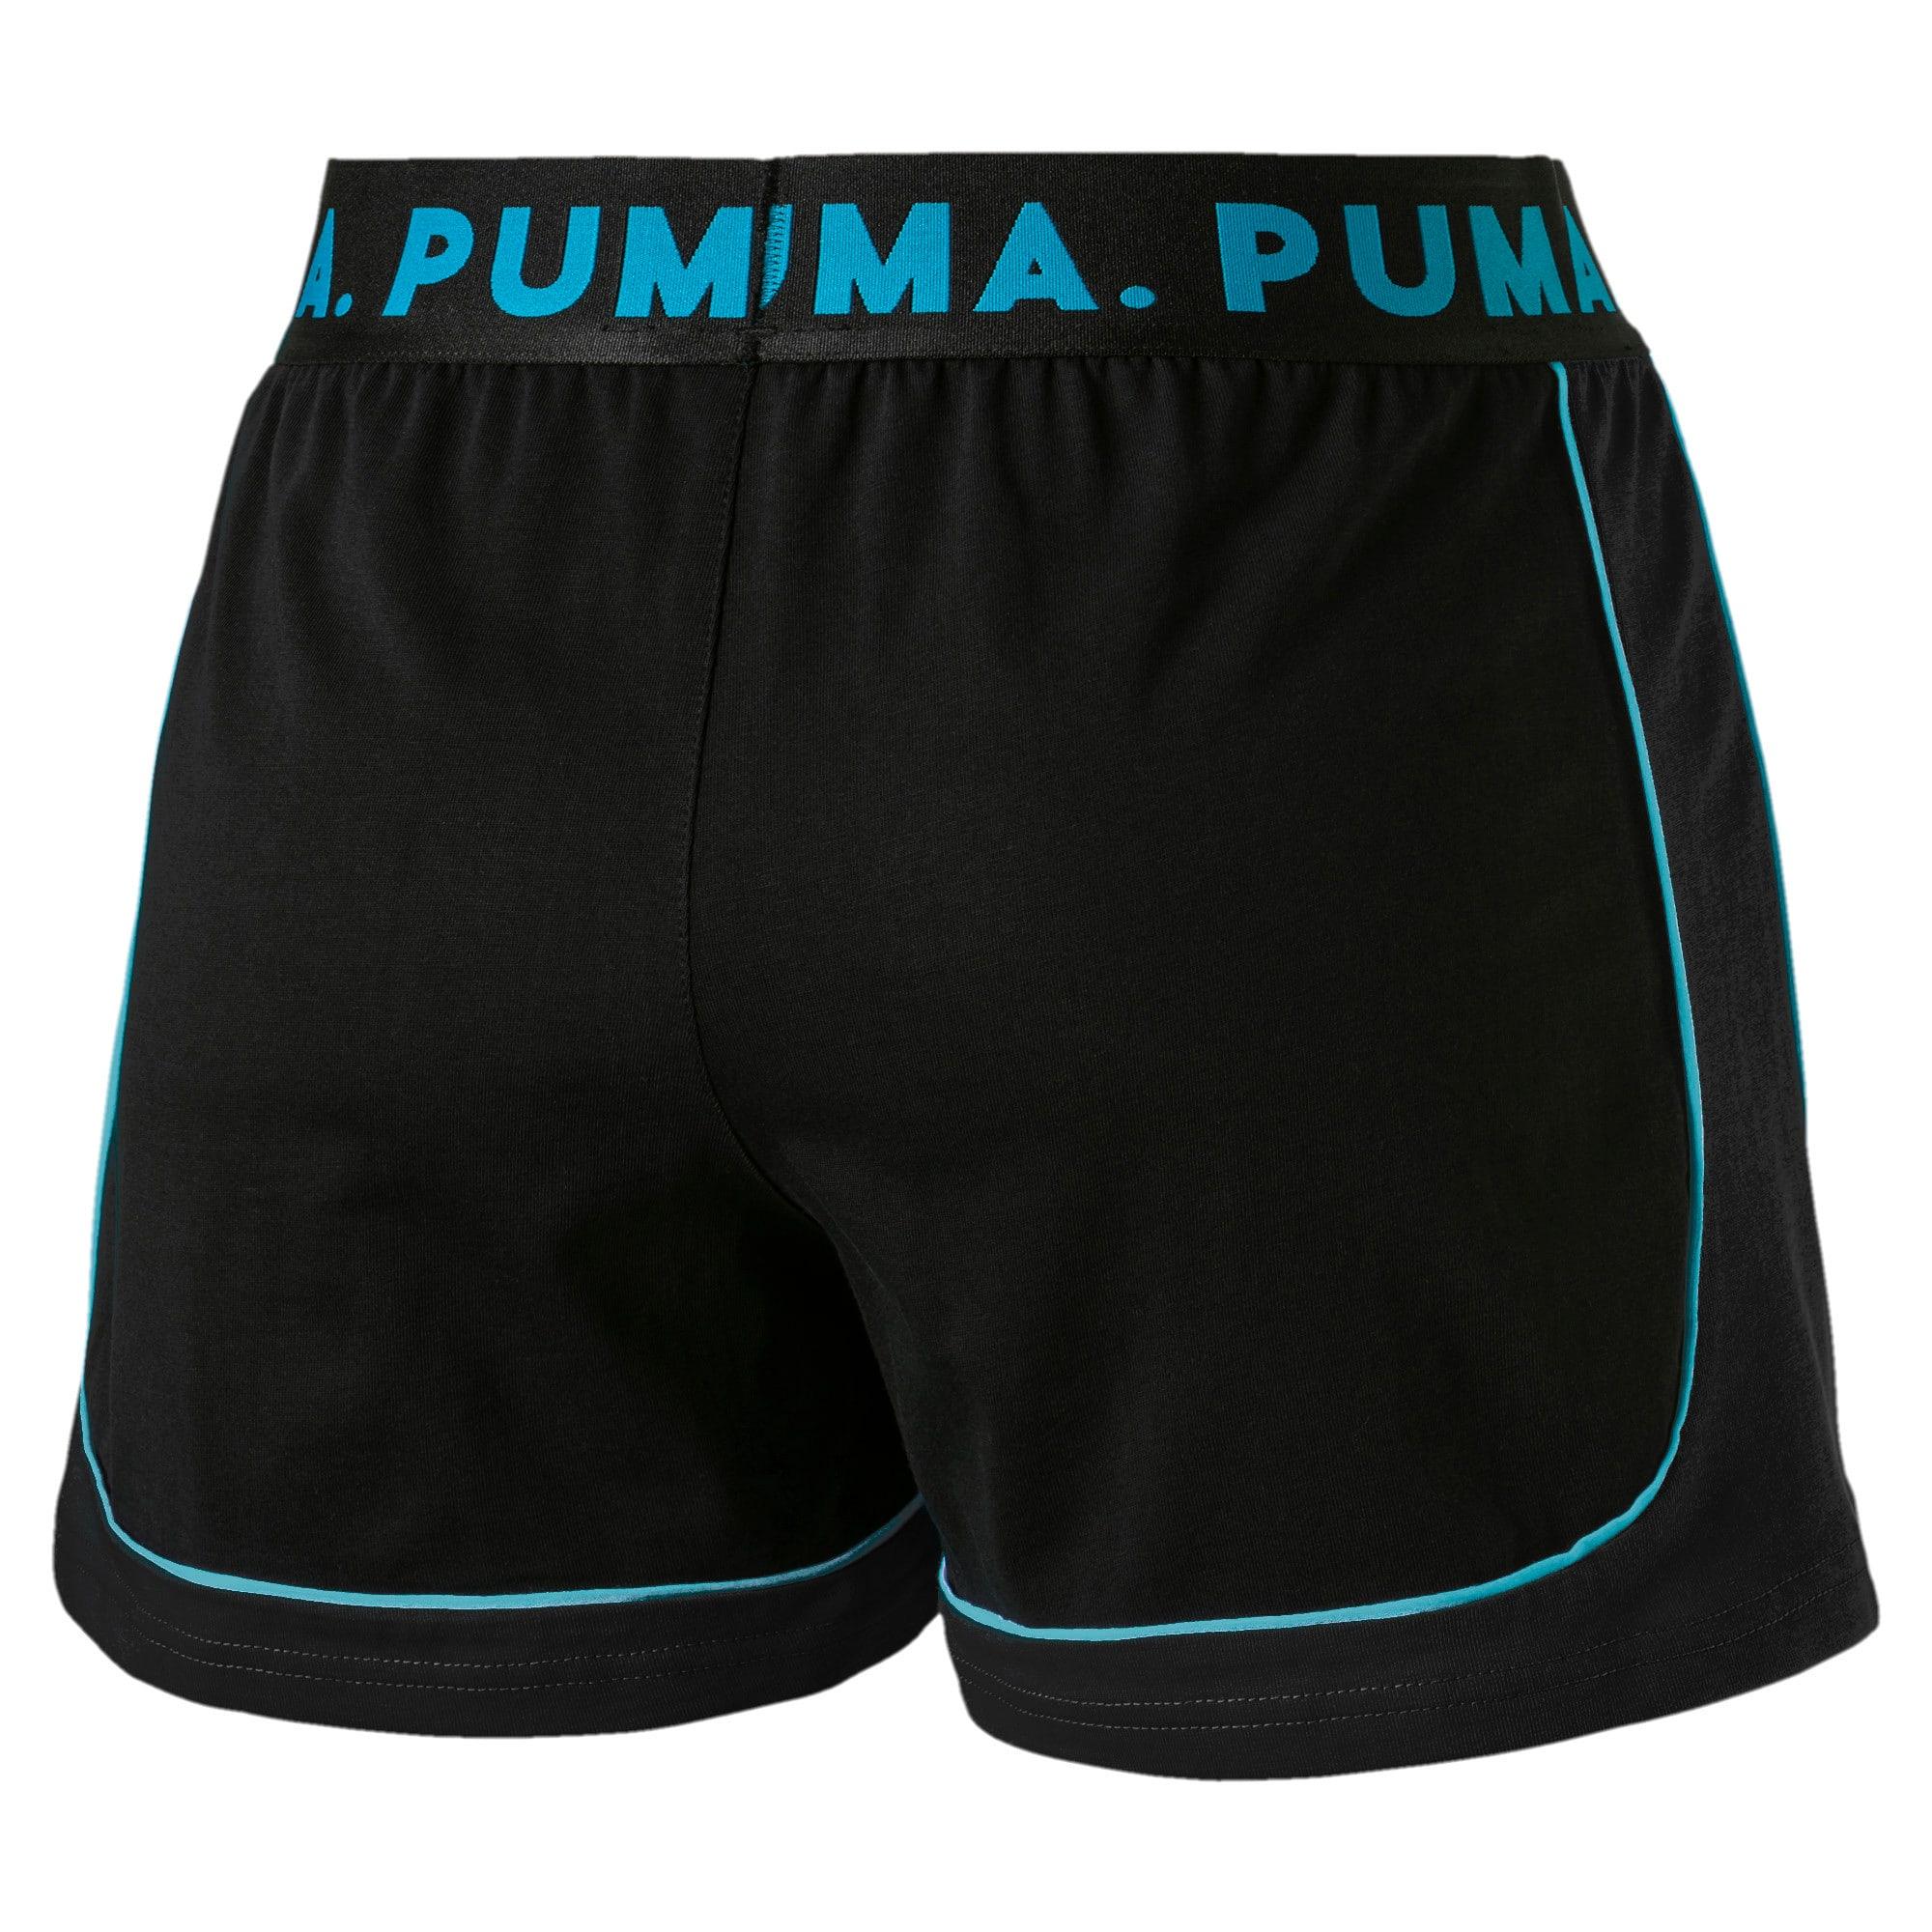 Miniatura 5 de Shorts Chase para mujer, Cotton Black-Caribbean Sea, mediano